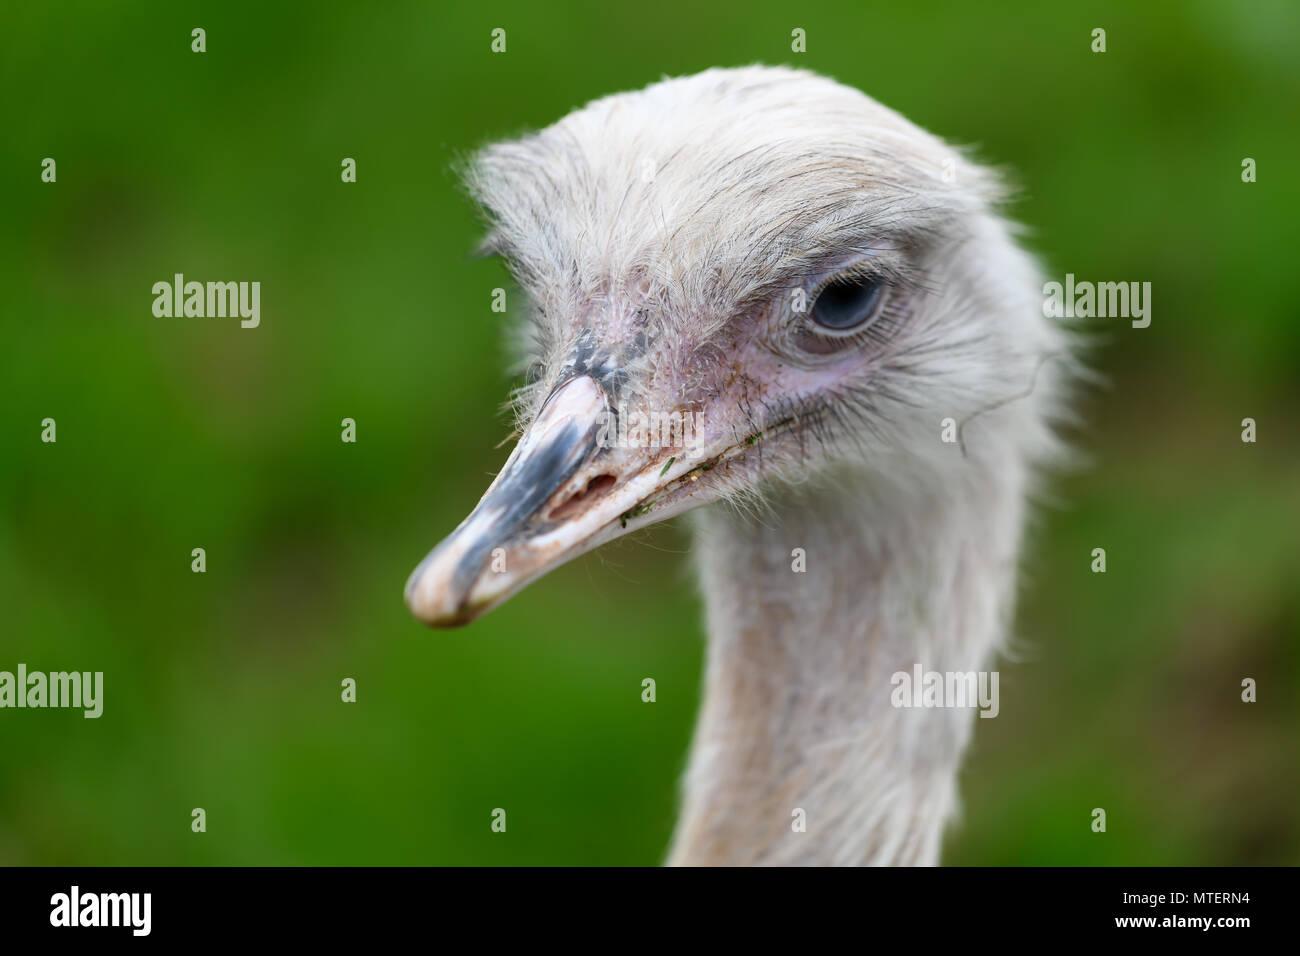 Rhea bird portrait - Stock Image